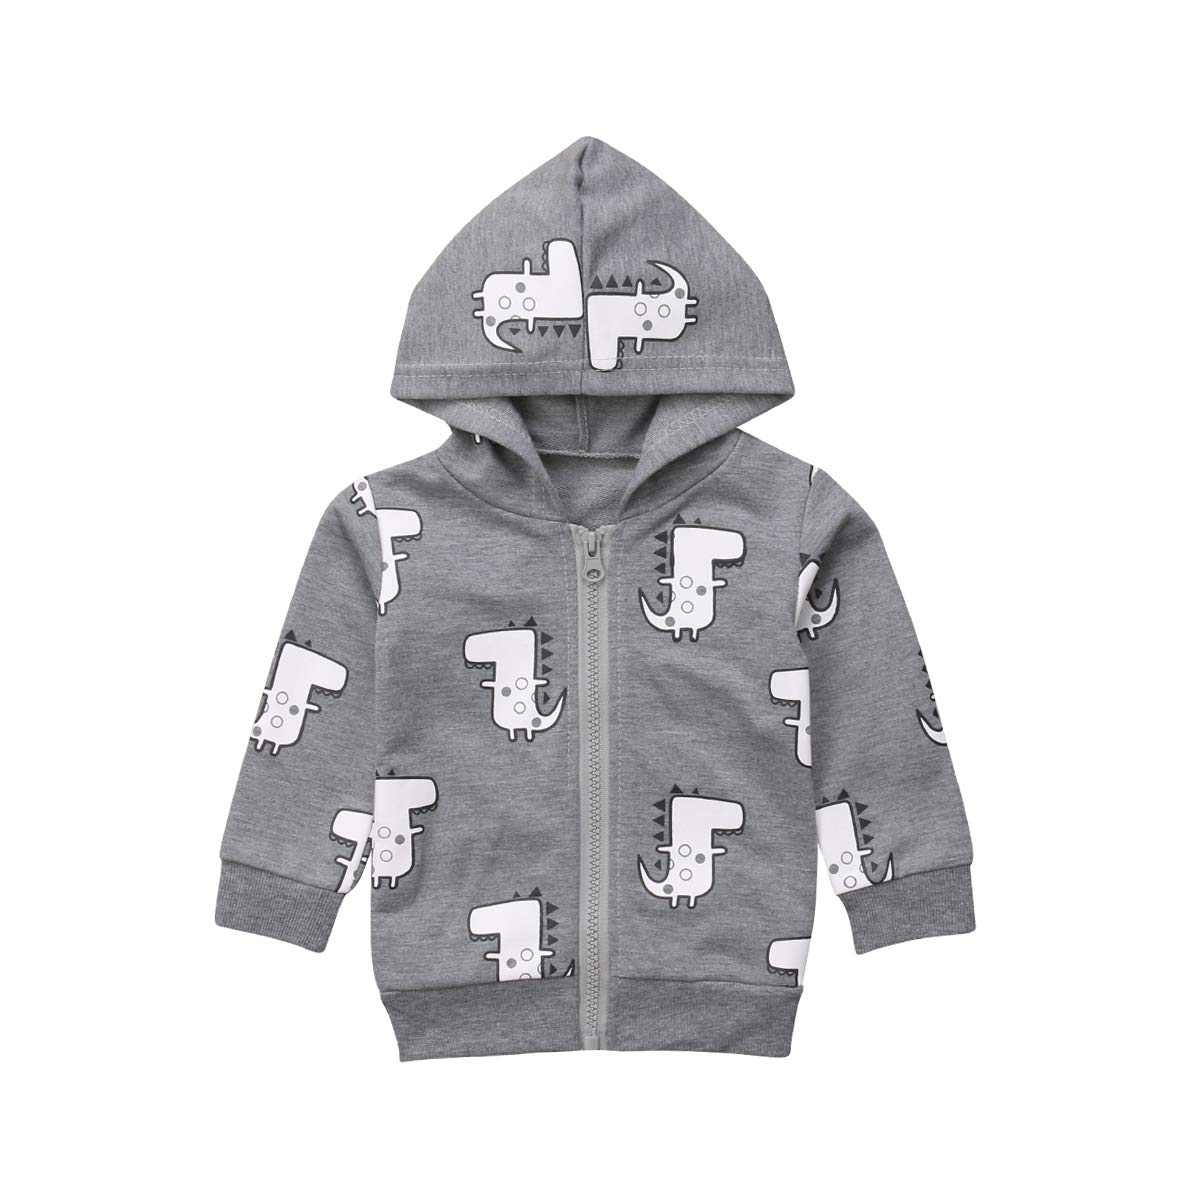 WANGSCANIS Dinosaur Baby Boys Kids Zipper Hooded Jacket Hoodies Coat Sweatshirt Outerwear